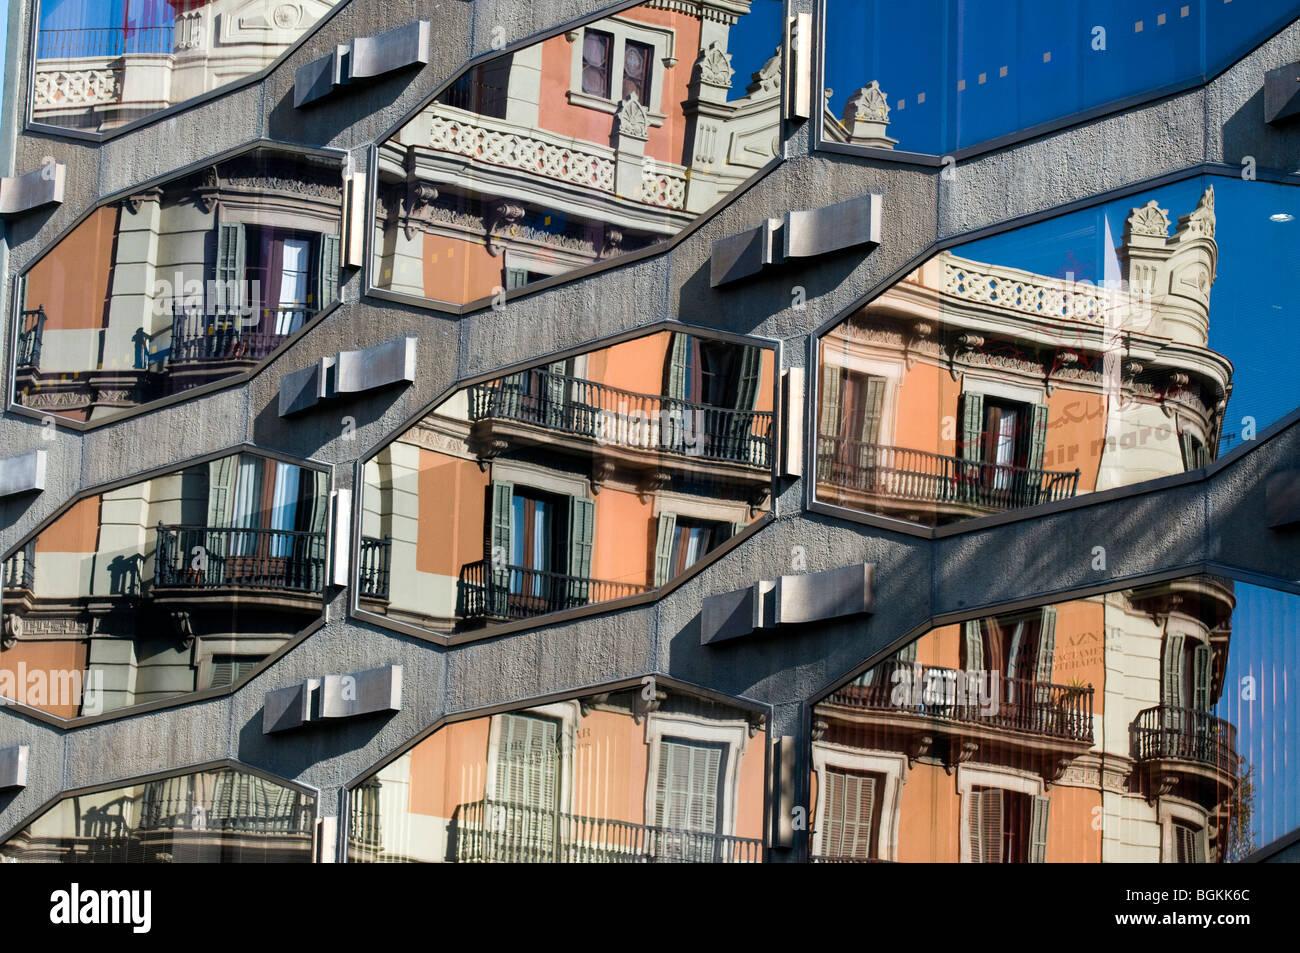 New and old buildings' reflection in Plaça de Urquinaona, Barcelona, Catalunya, Spain - Stock Image